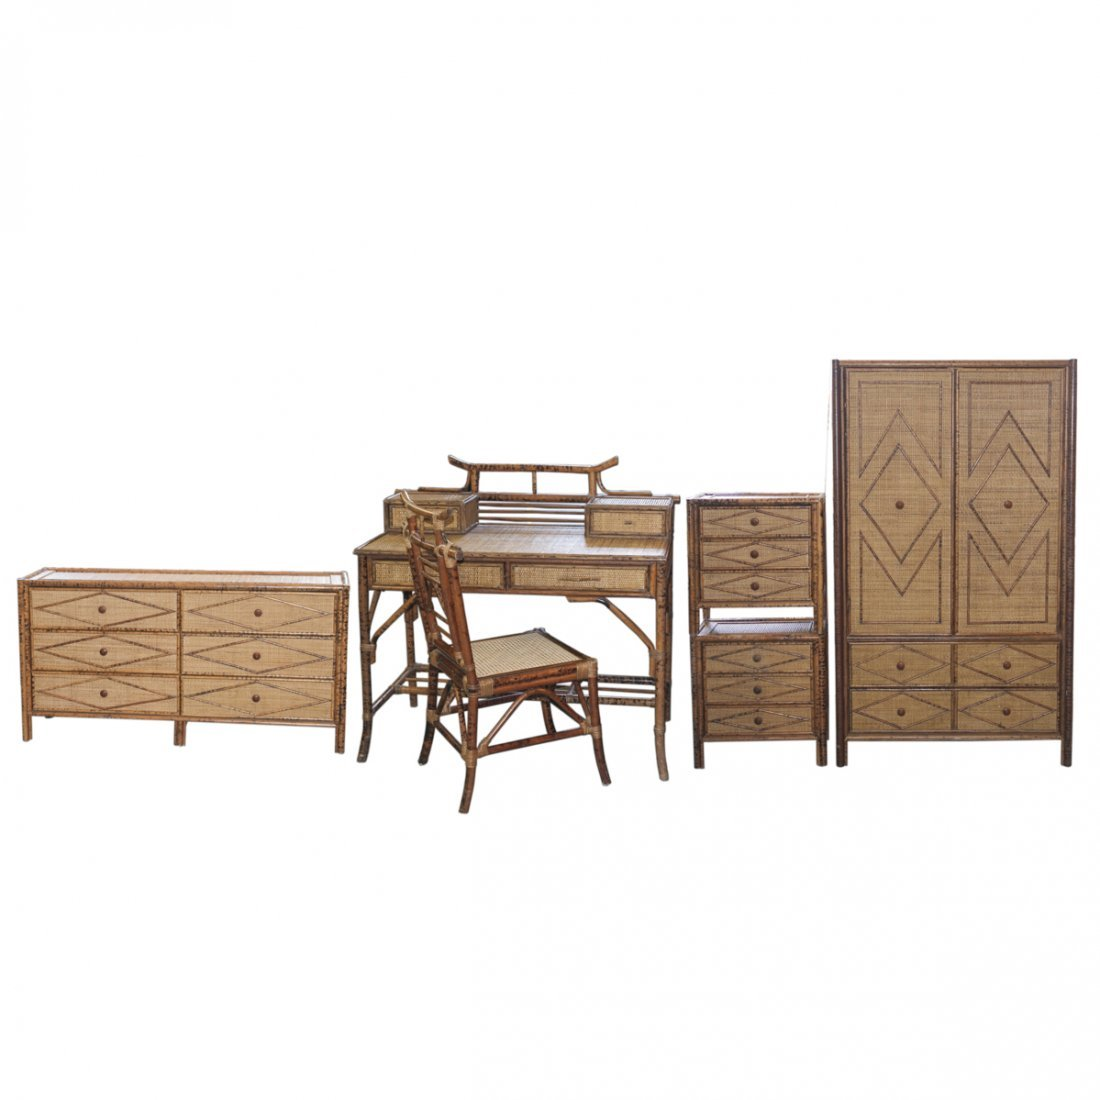 Vintage Wicker & Bamboo Furniture Set